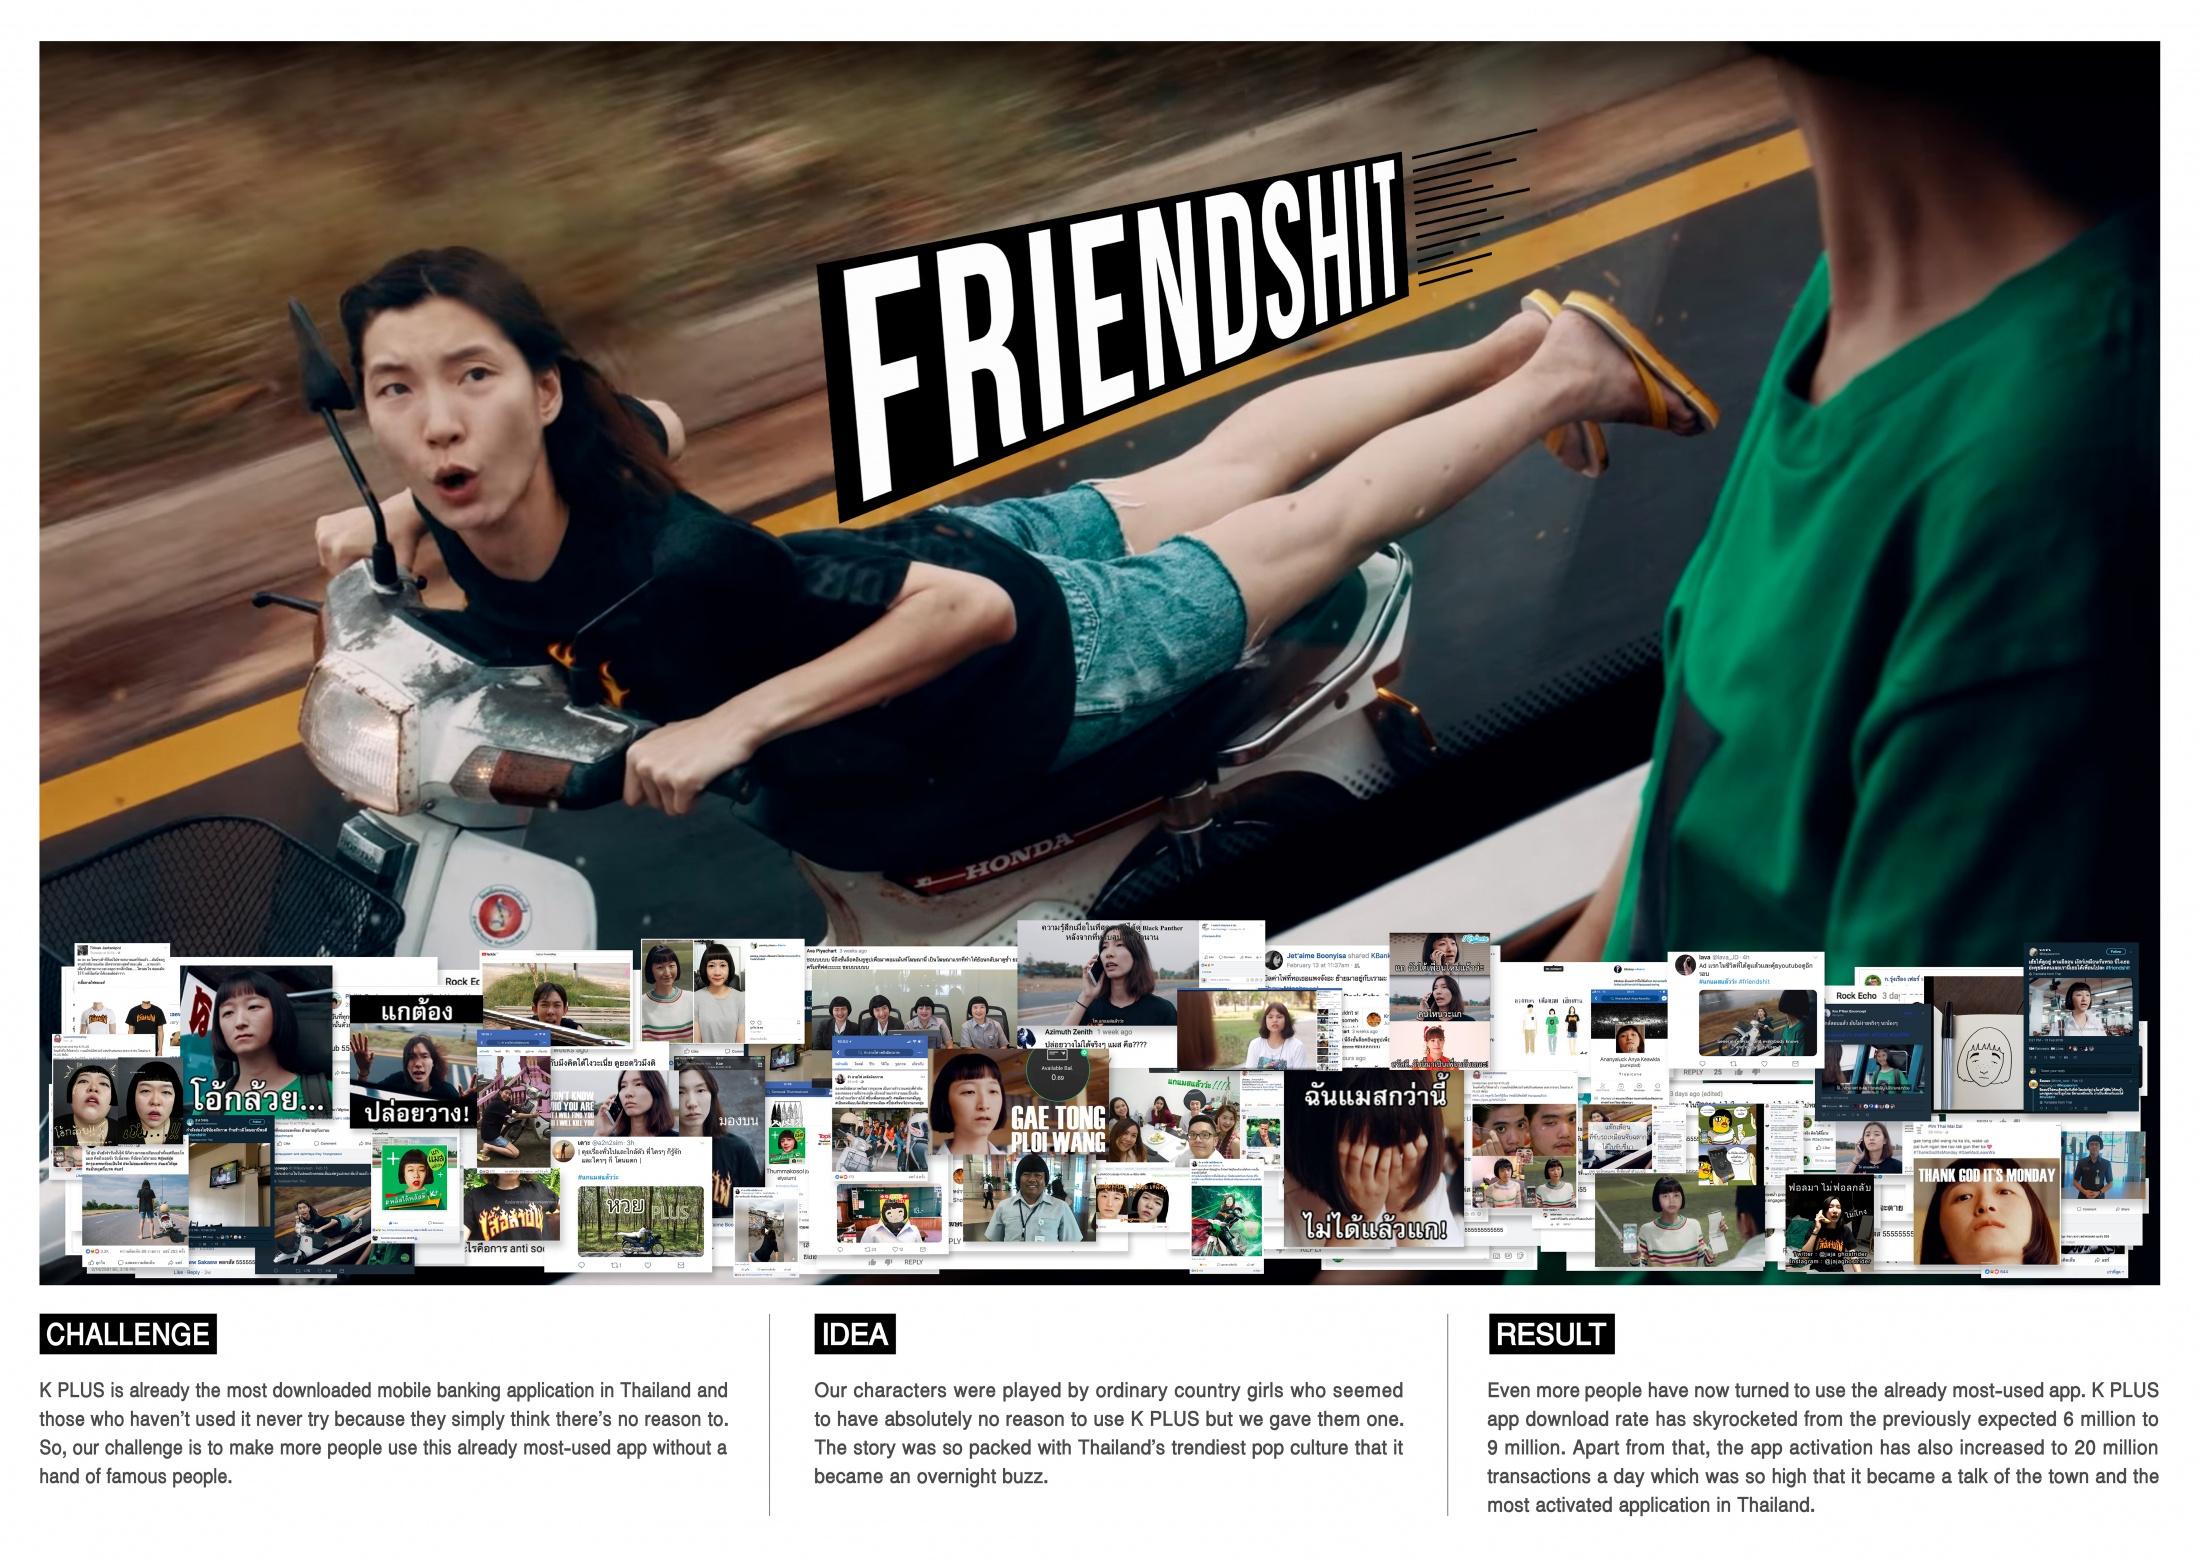 Thumbnail for FRIENDSHIT